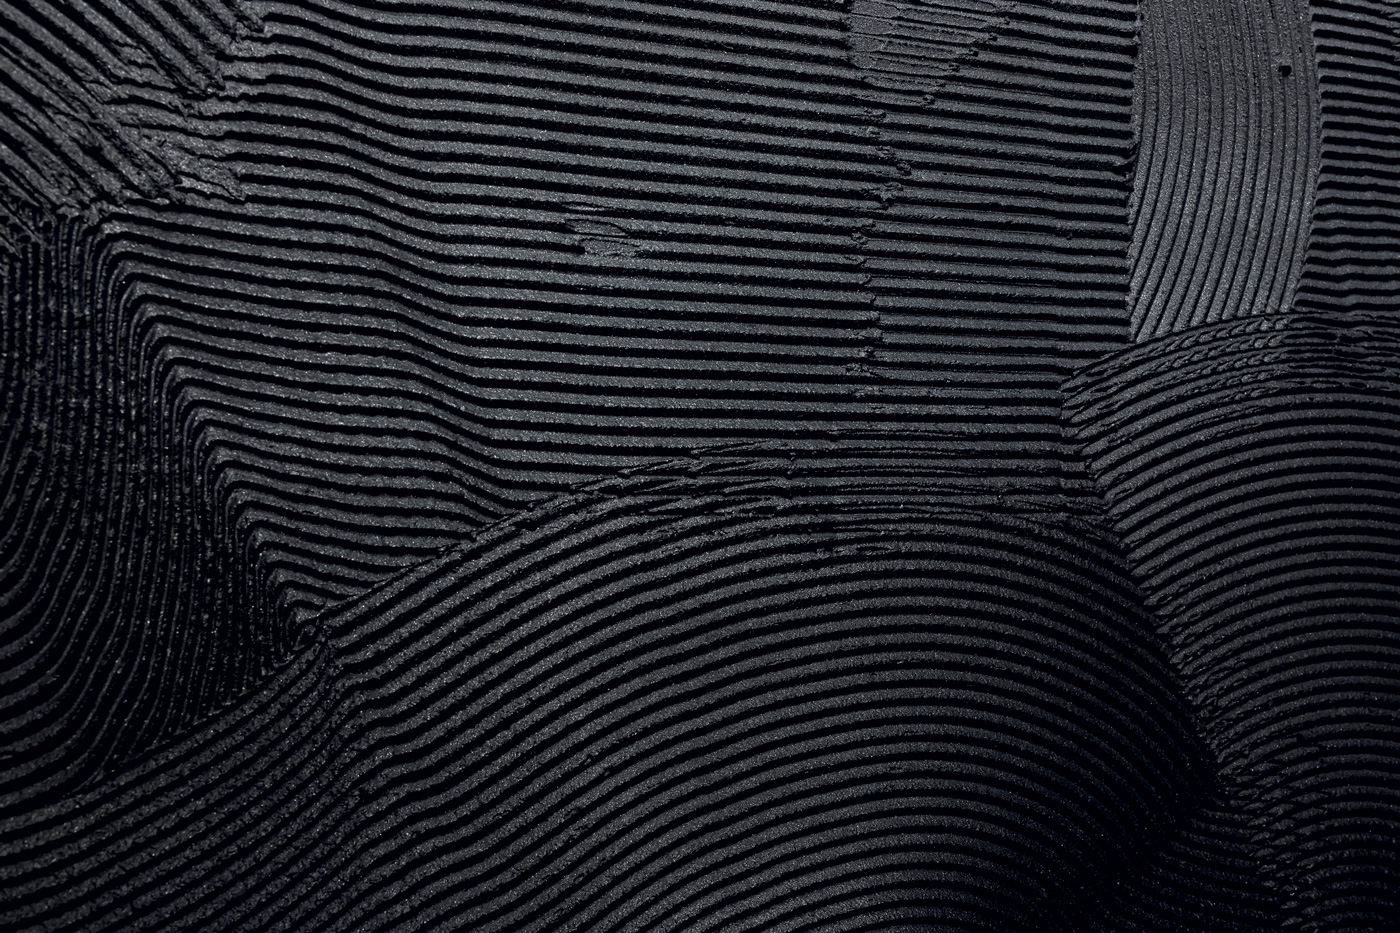 blackconcrete.jpg